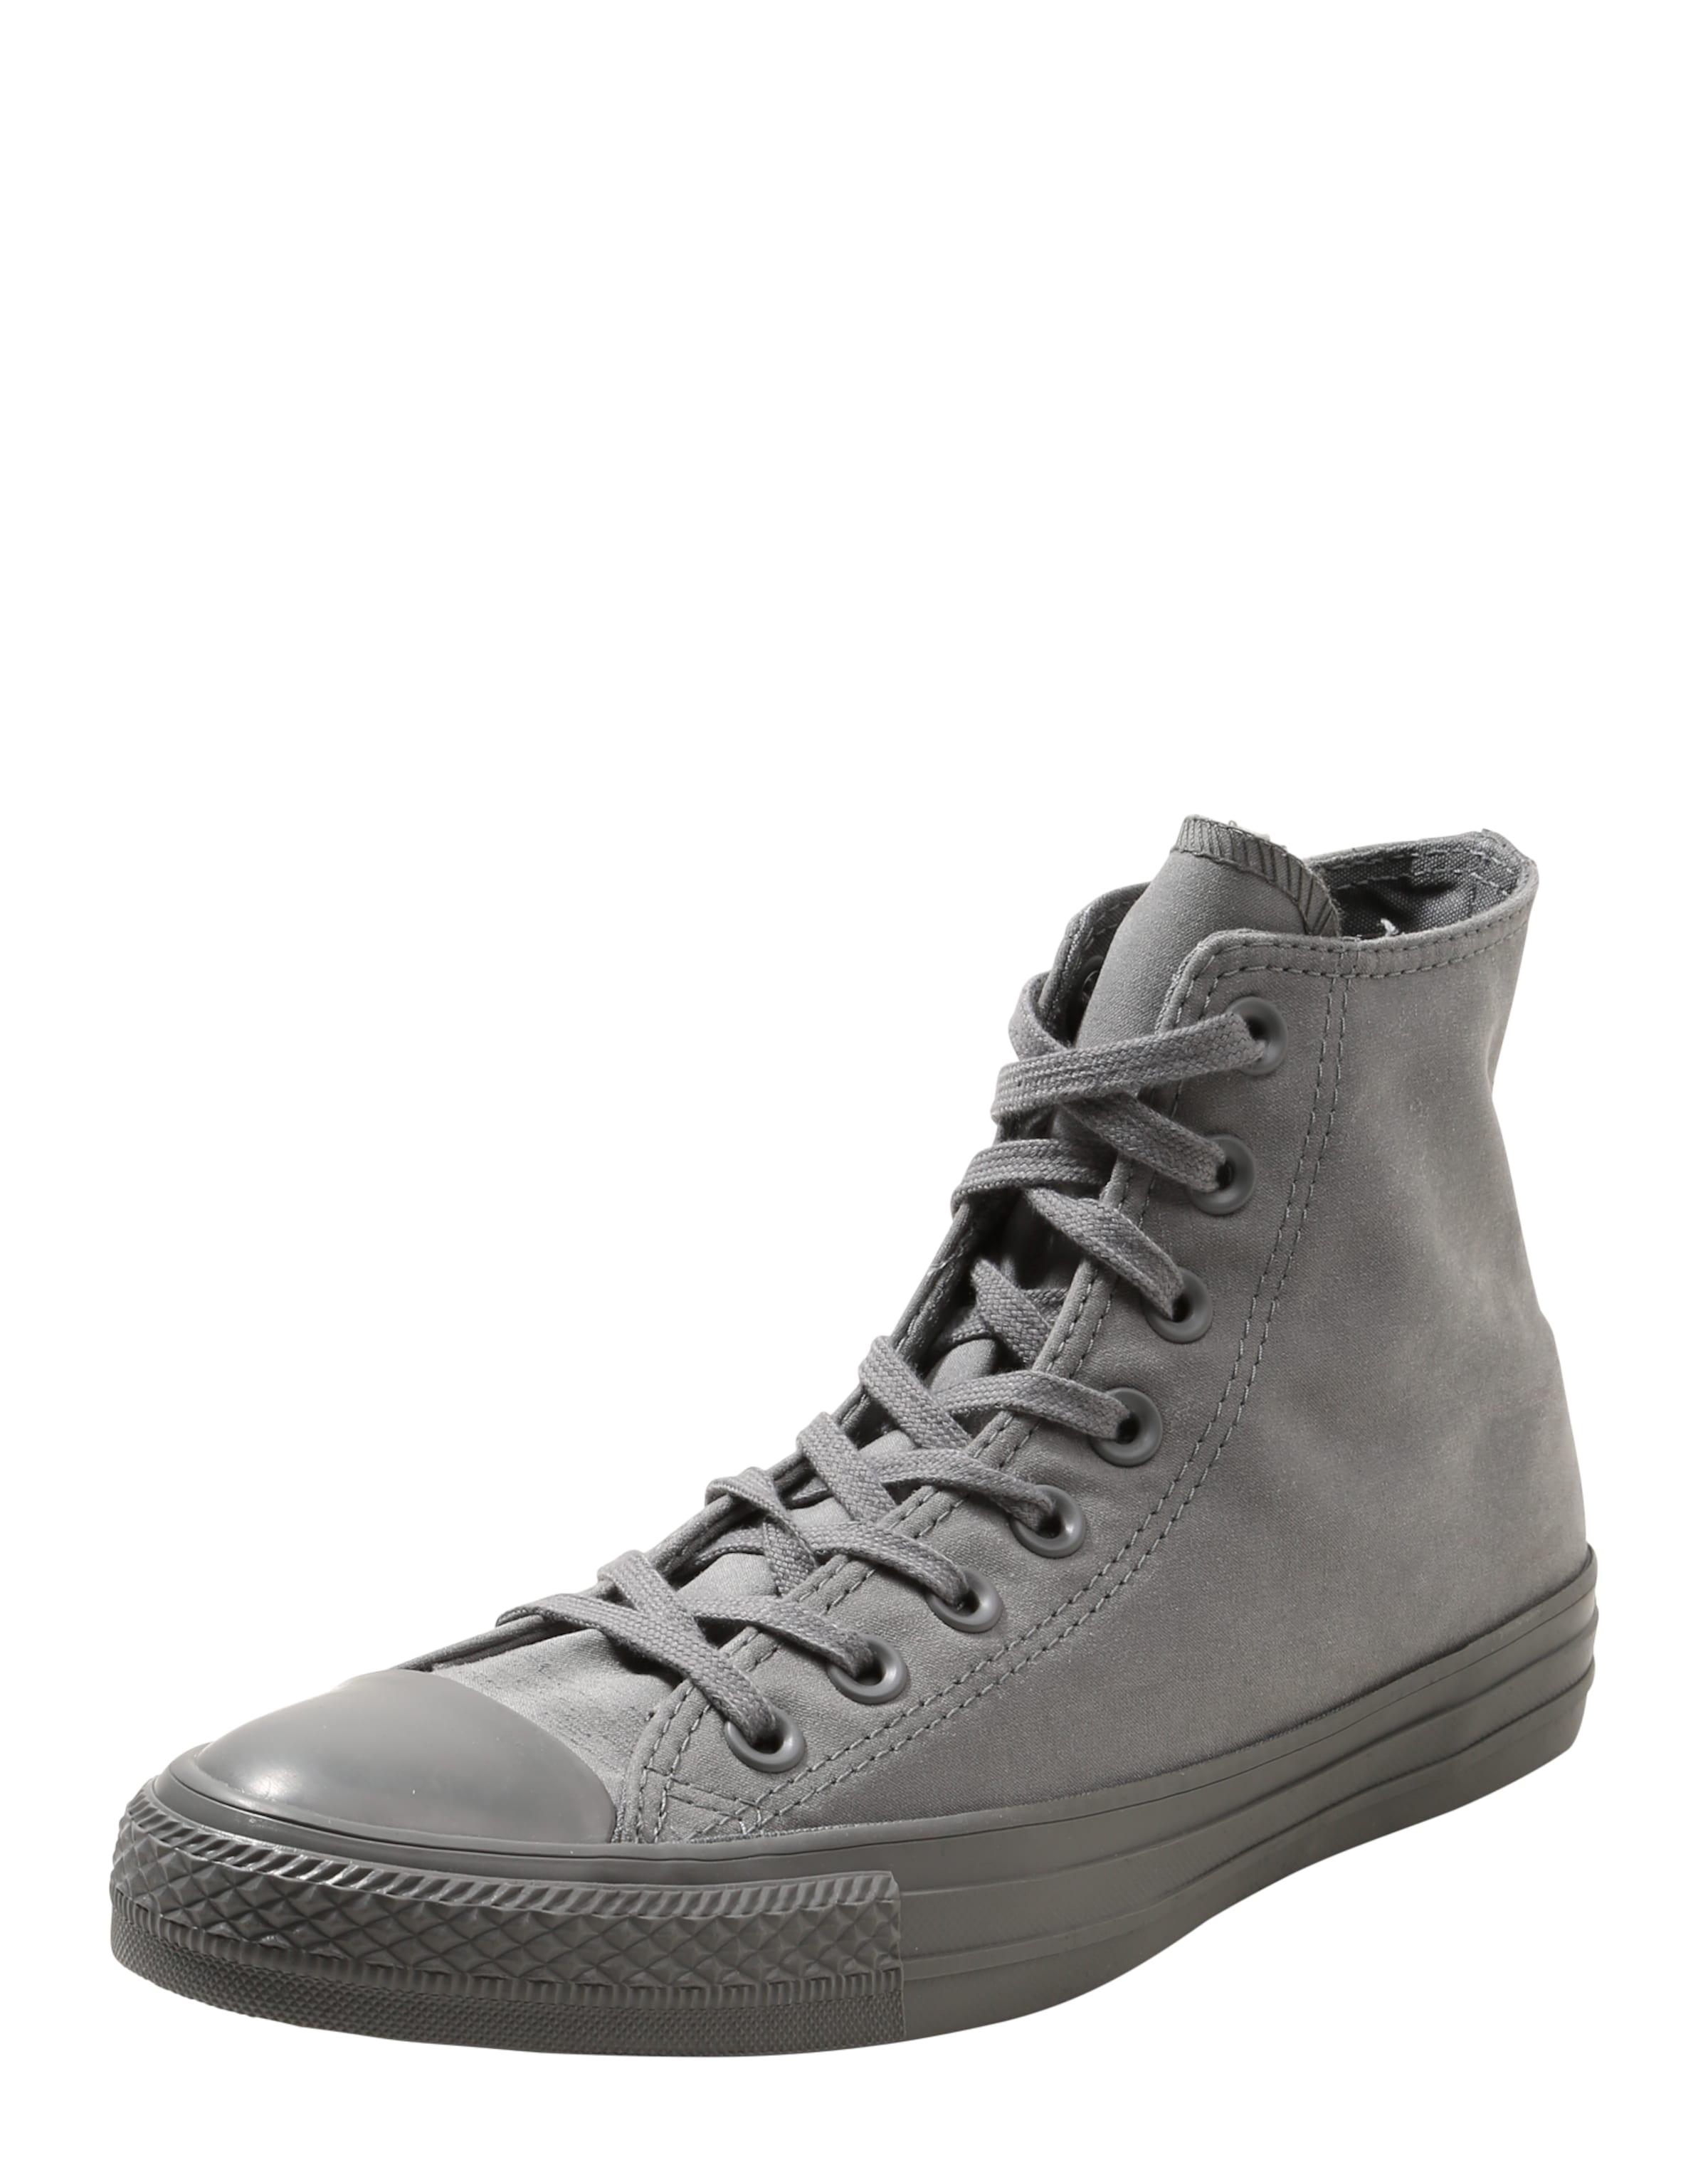 CONVERSE Sneaker High  Chuck Taylor All Star - Hi